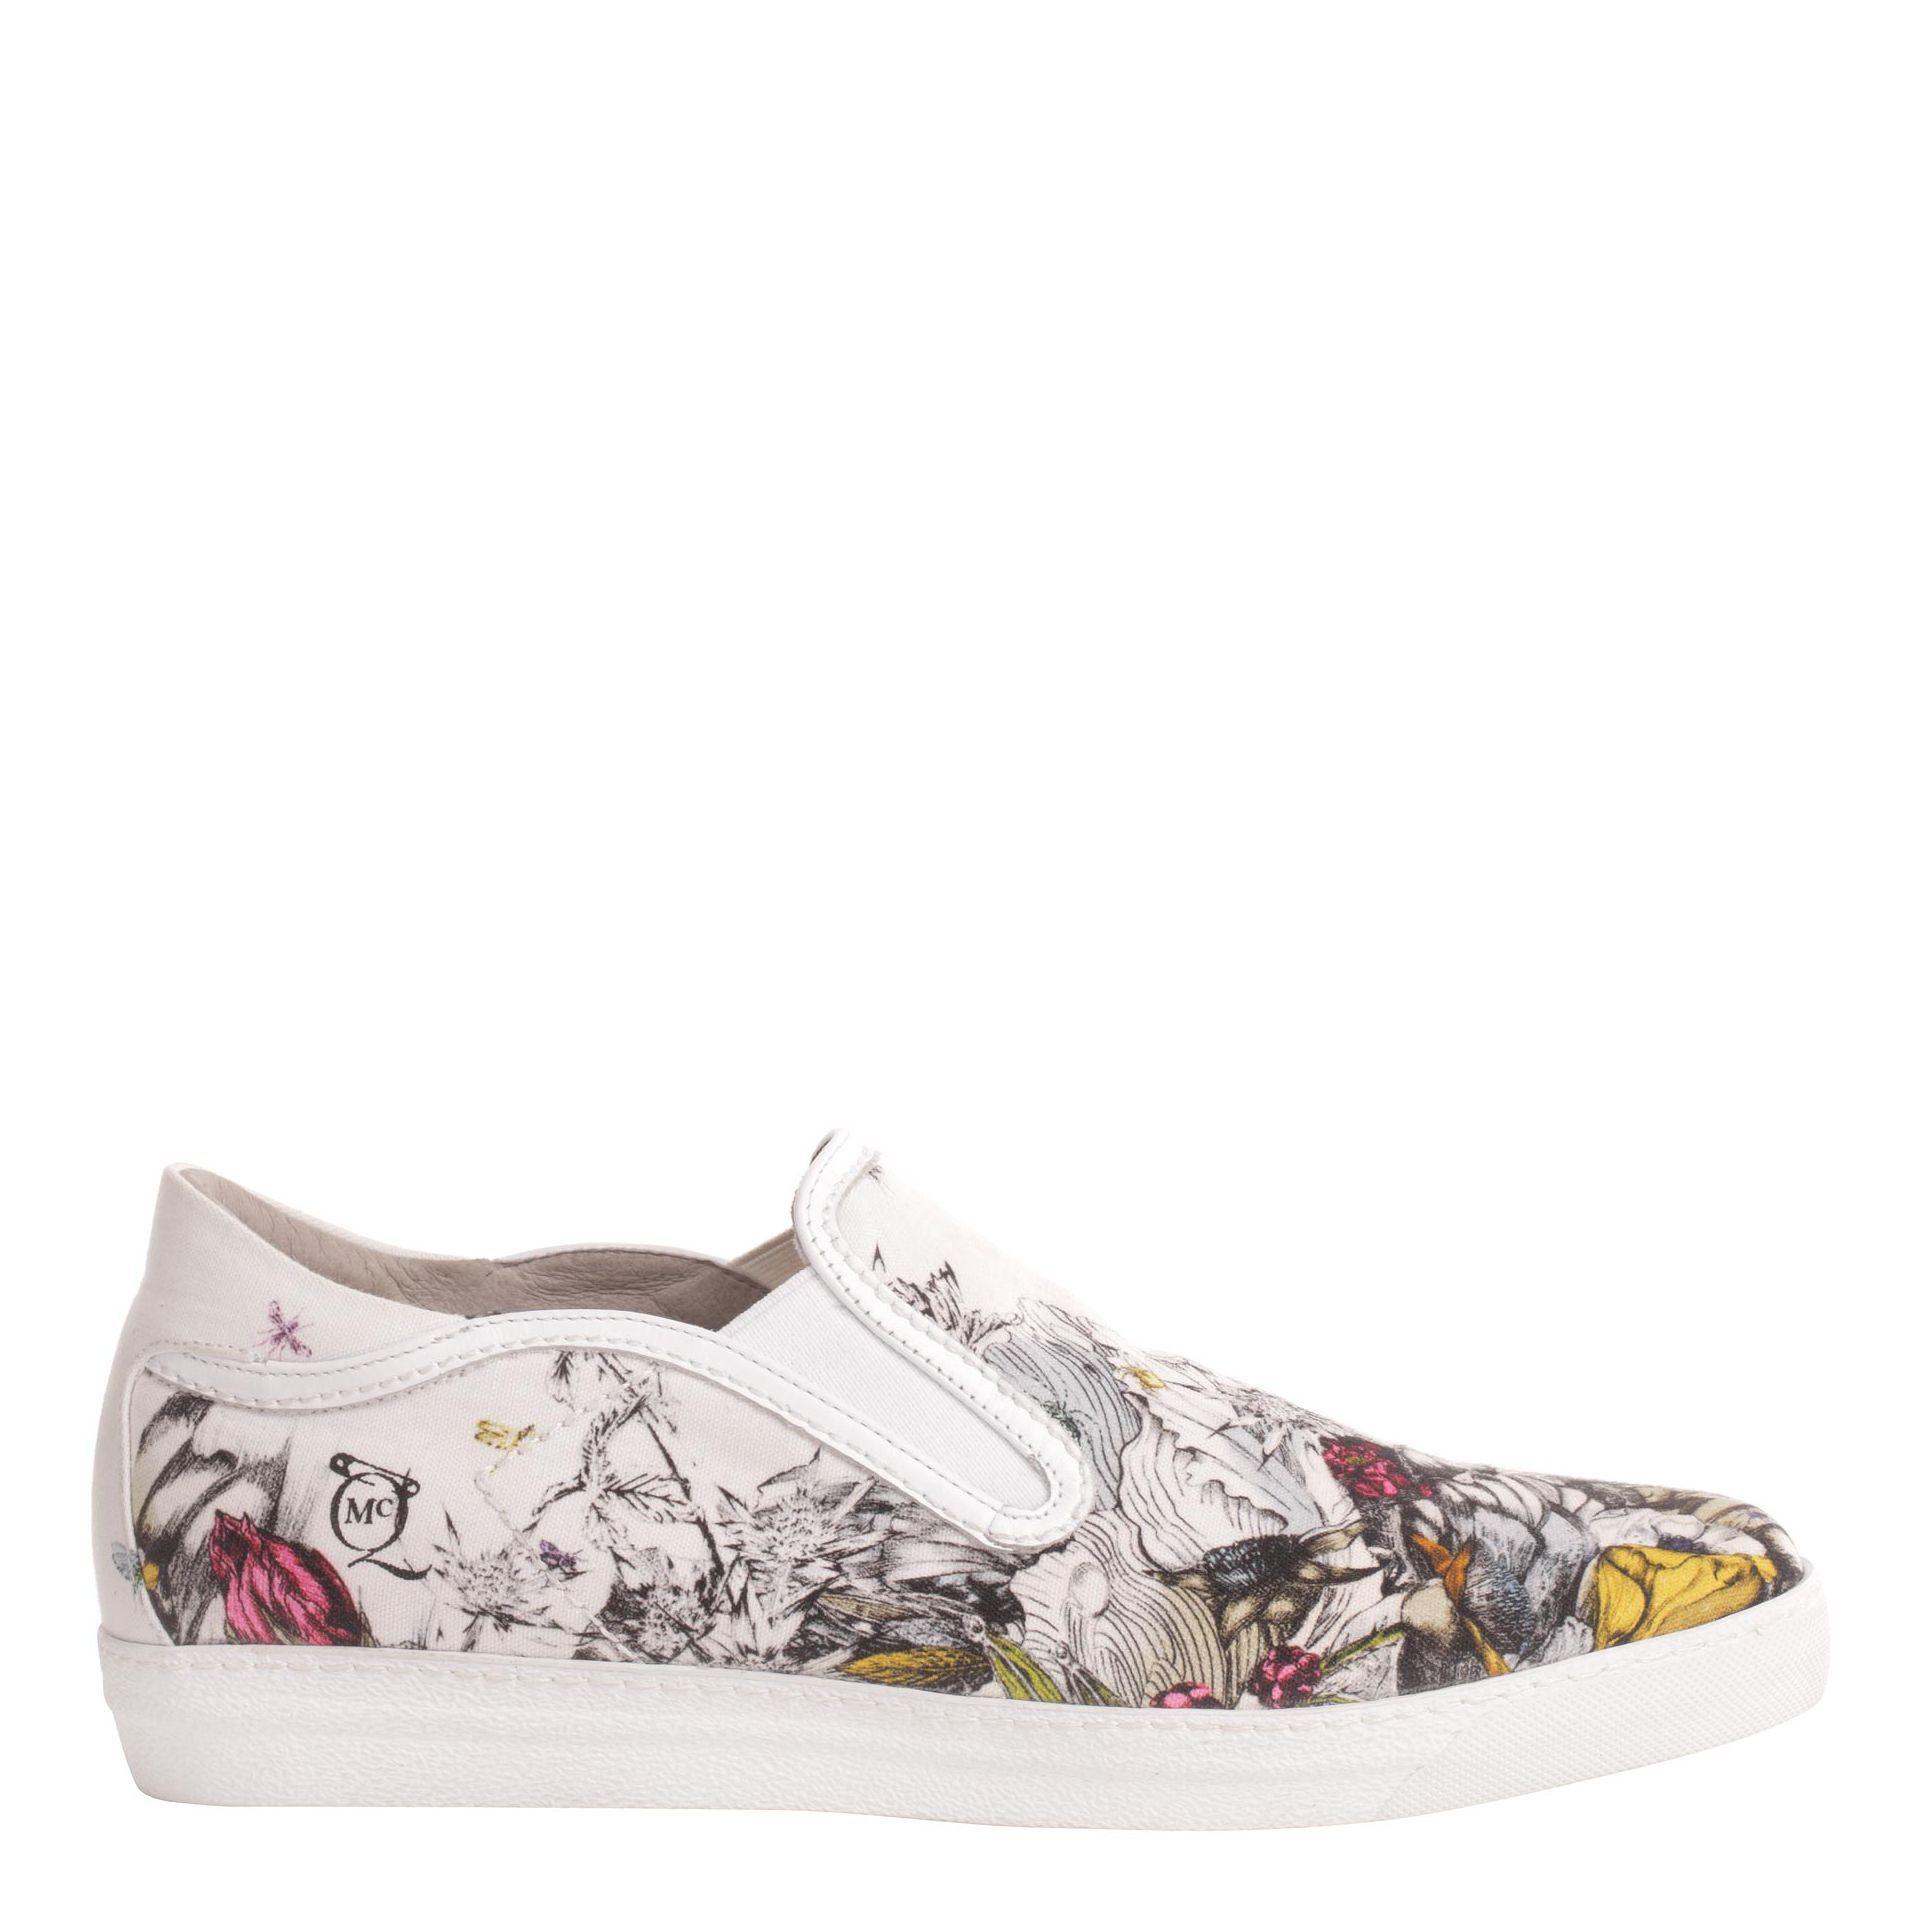 Mens designer shoes, Canvas plimsolls